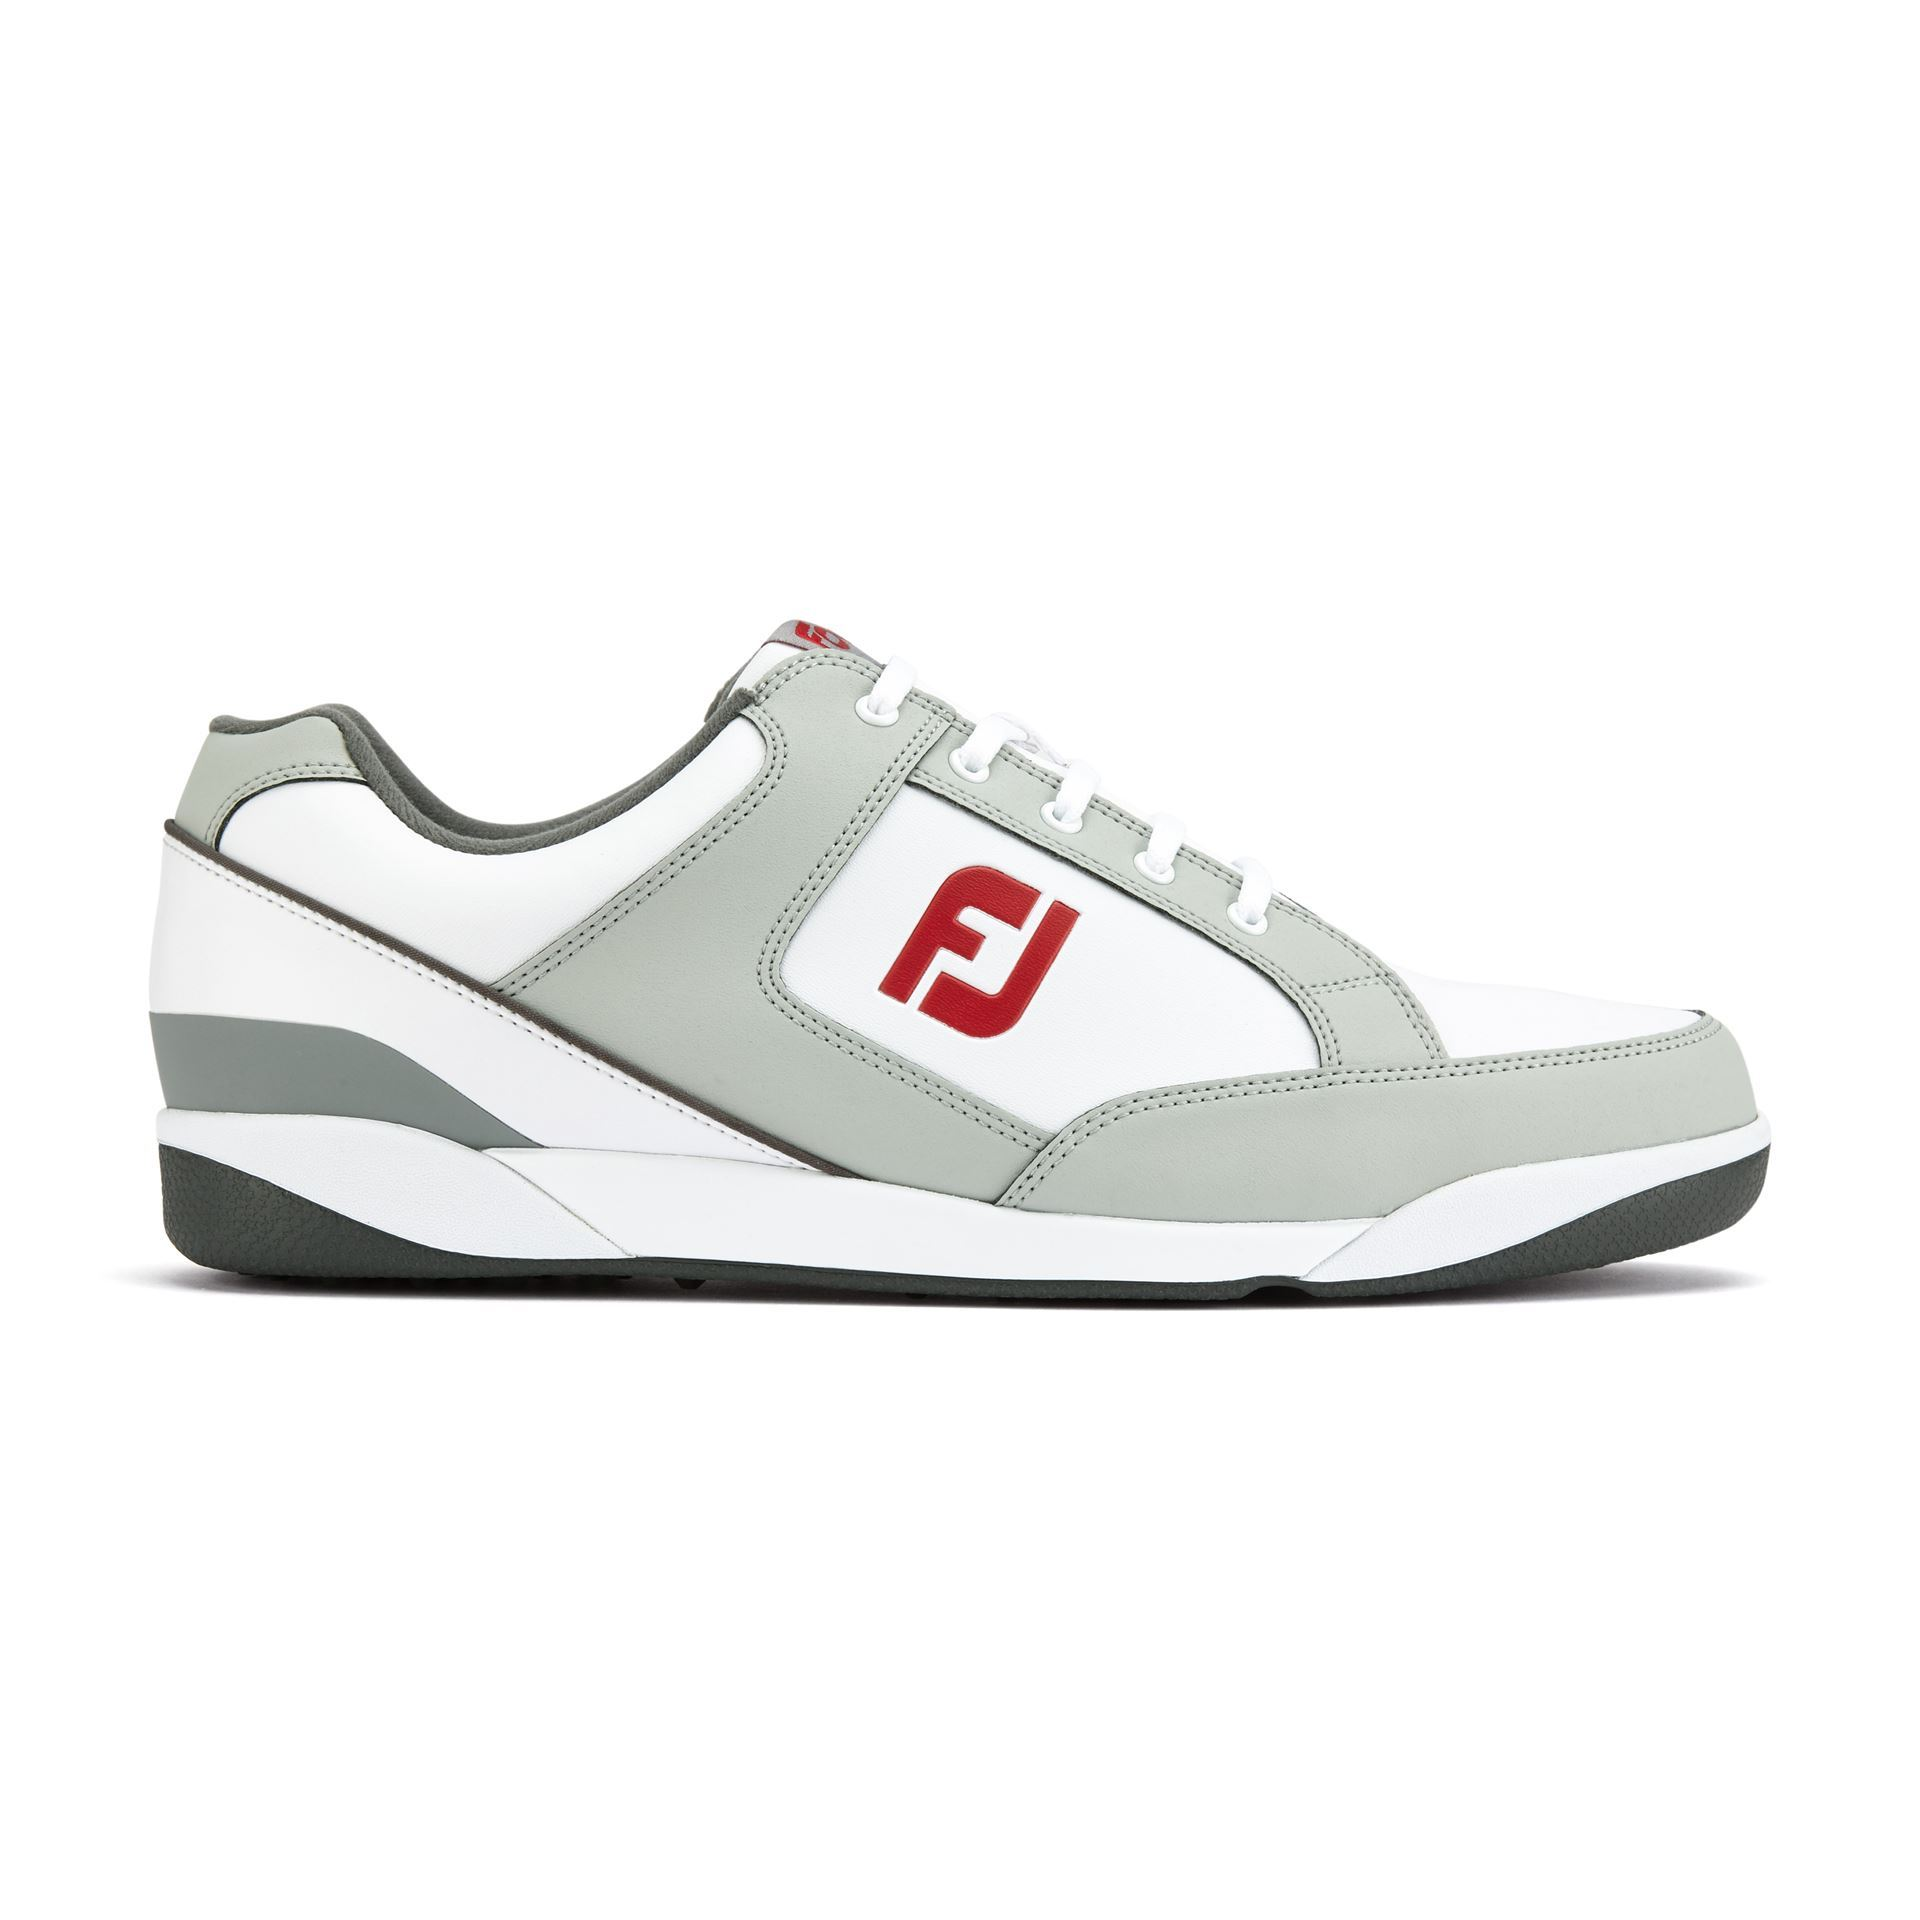 Footjoy Mens Originals Spikeless Golf Shoes